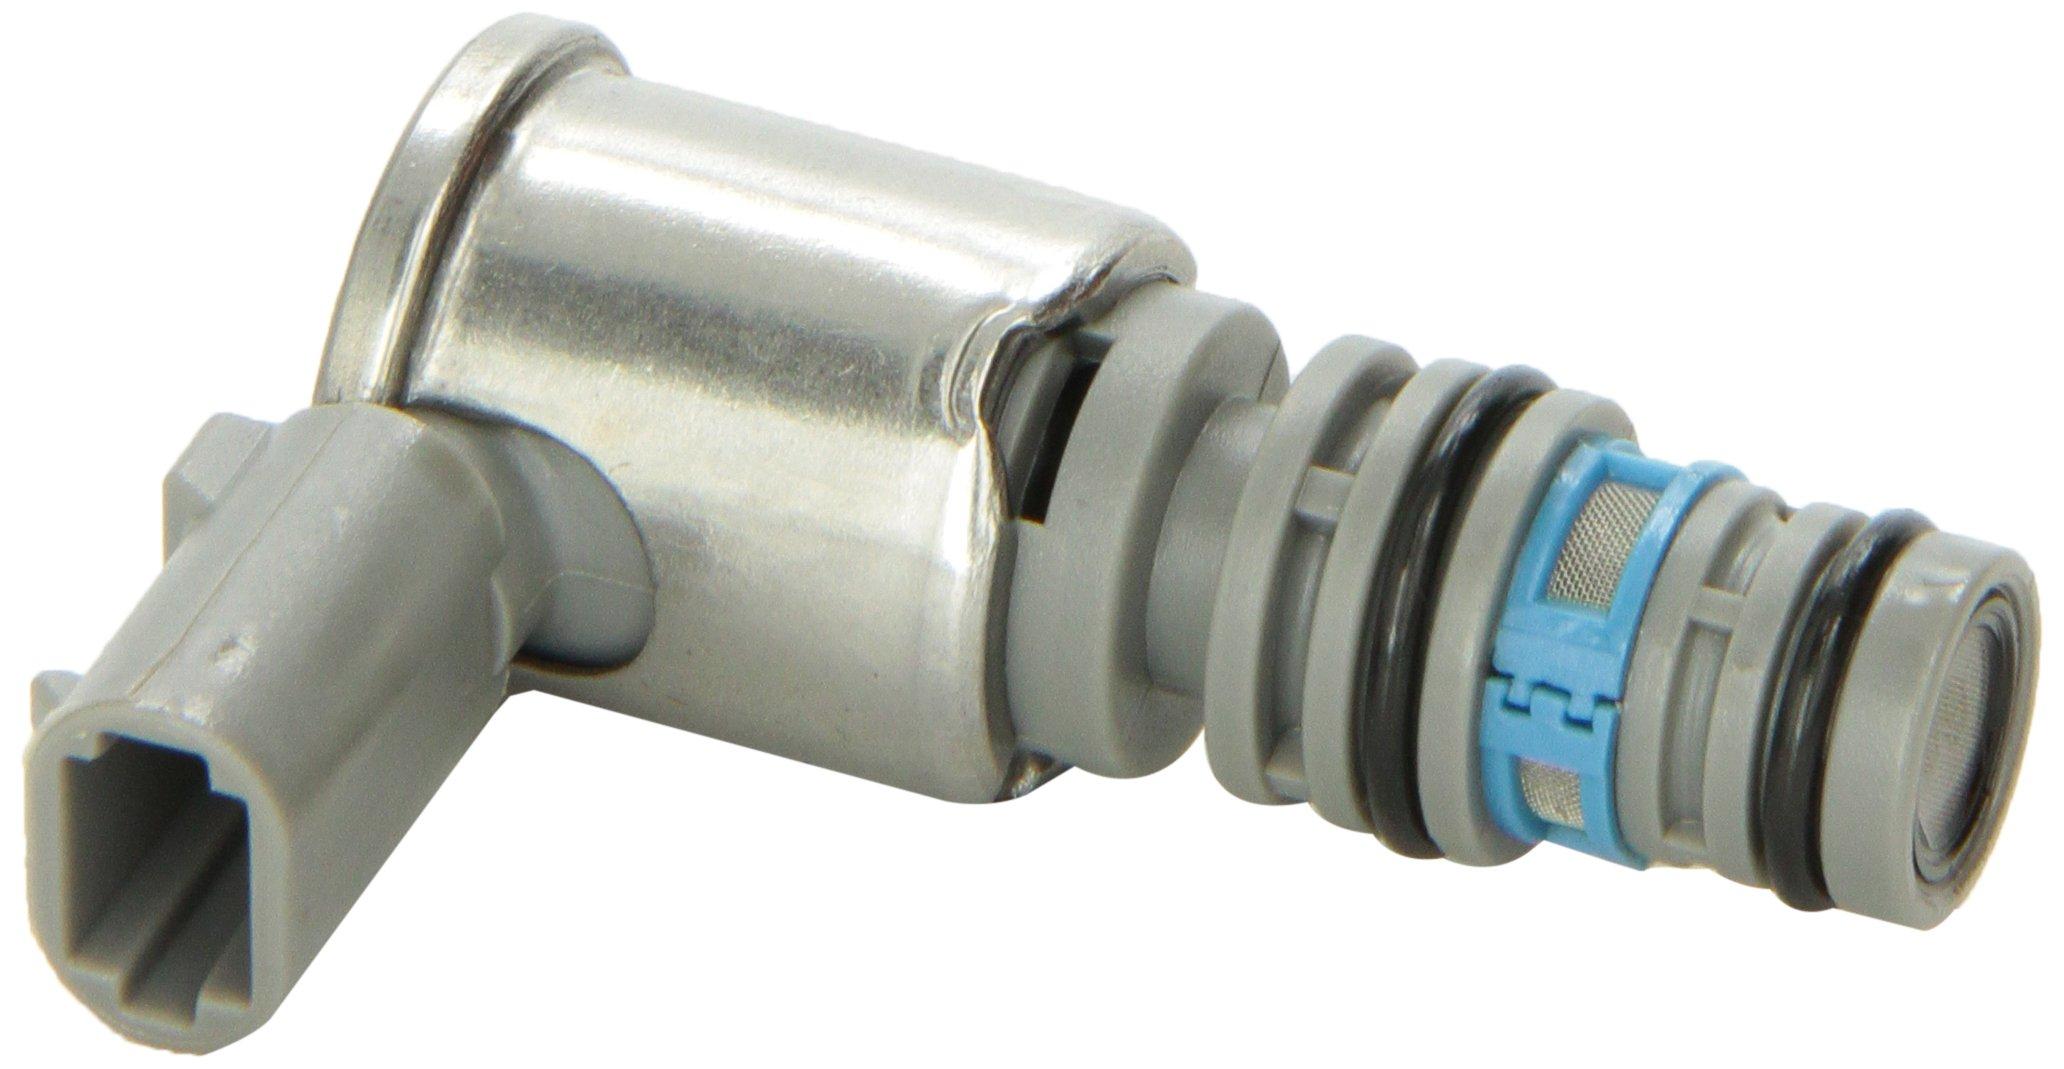 ATP JE-8 Automatic Transmission Control Solenoid